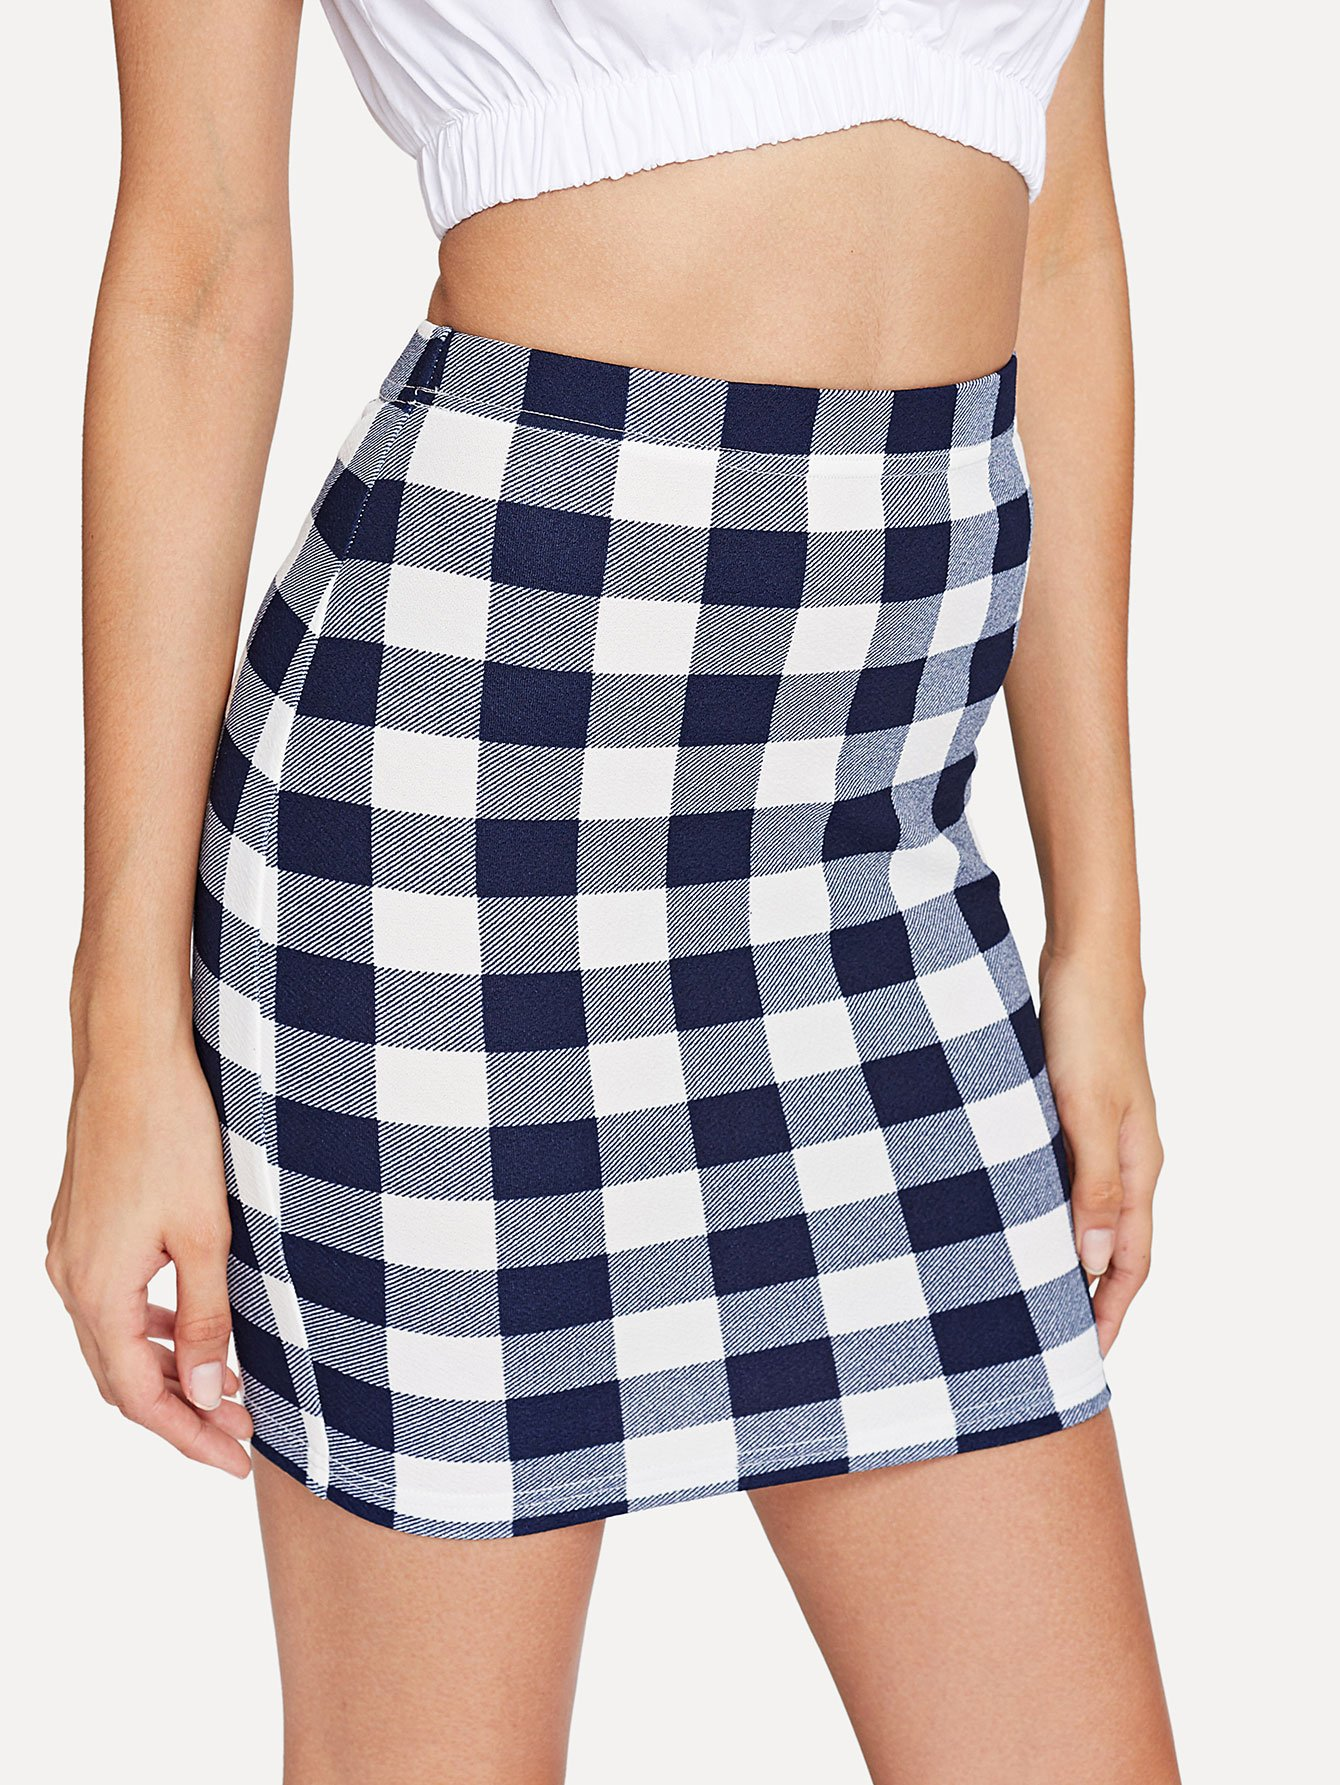 Plaid Bodycon Skirt stripe panel plaid bodycon skirt